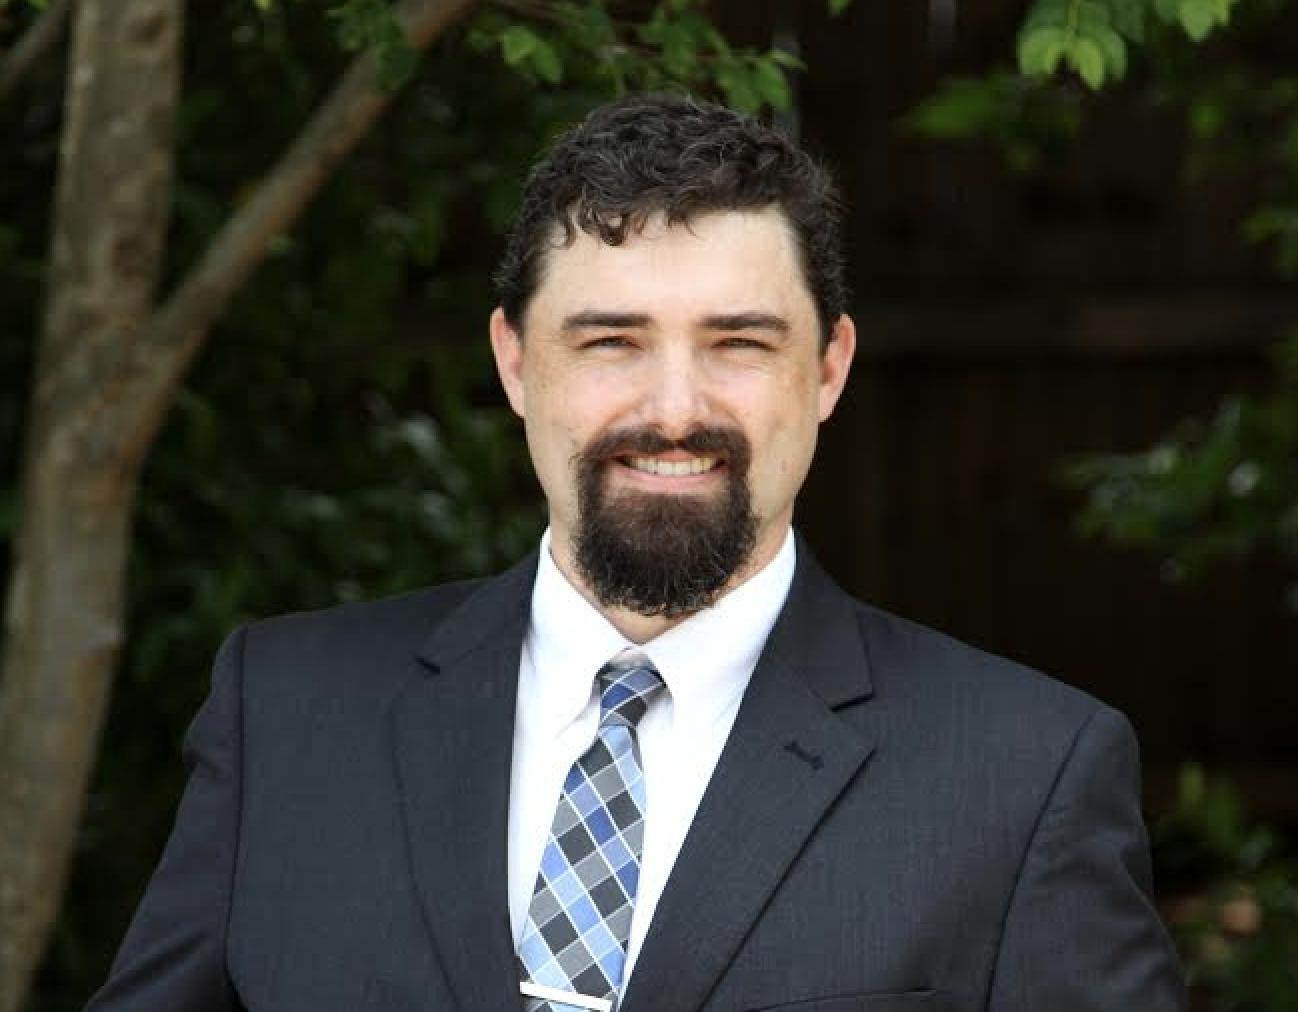 Dr. Dwayne Estes, Southeast Grassland Initiative